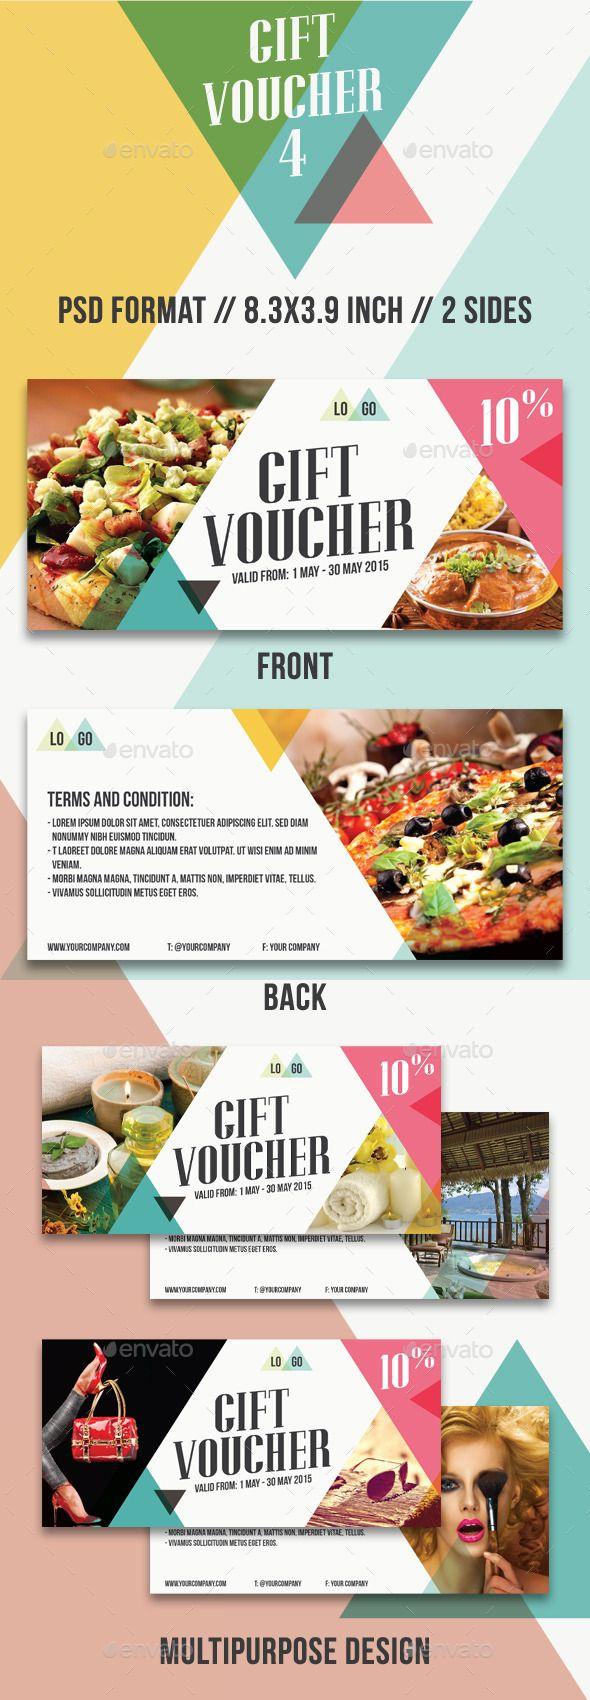 Gift Voucher Template #design Download: http://graphicriver.net/item/gift-voucher-4/11611447?ref=ksioks